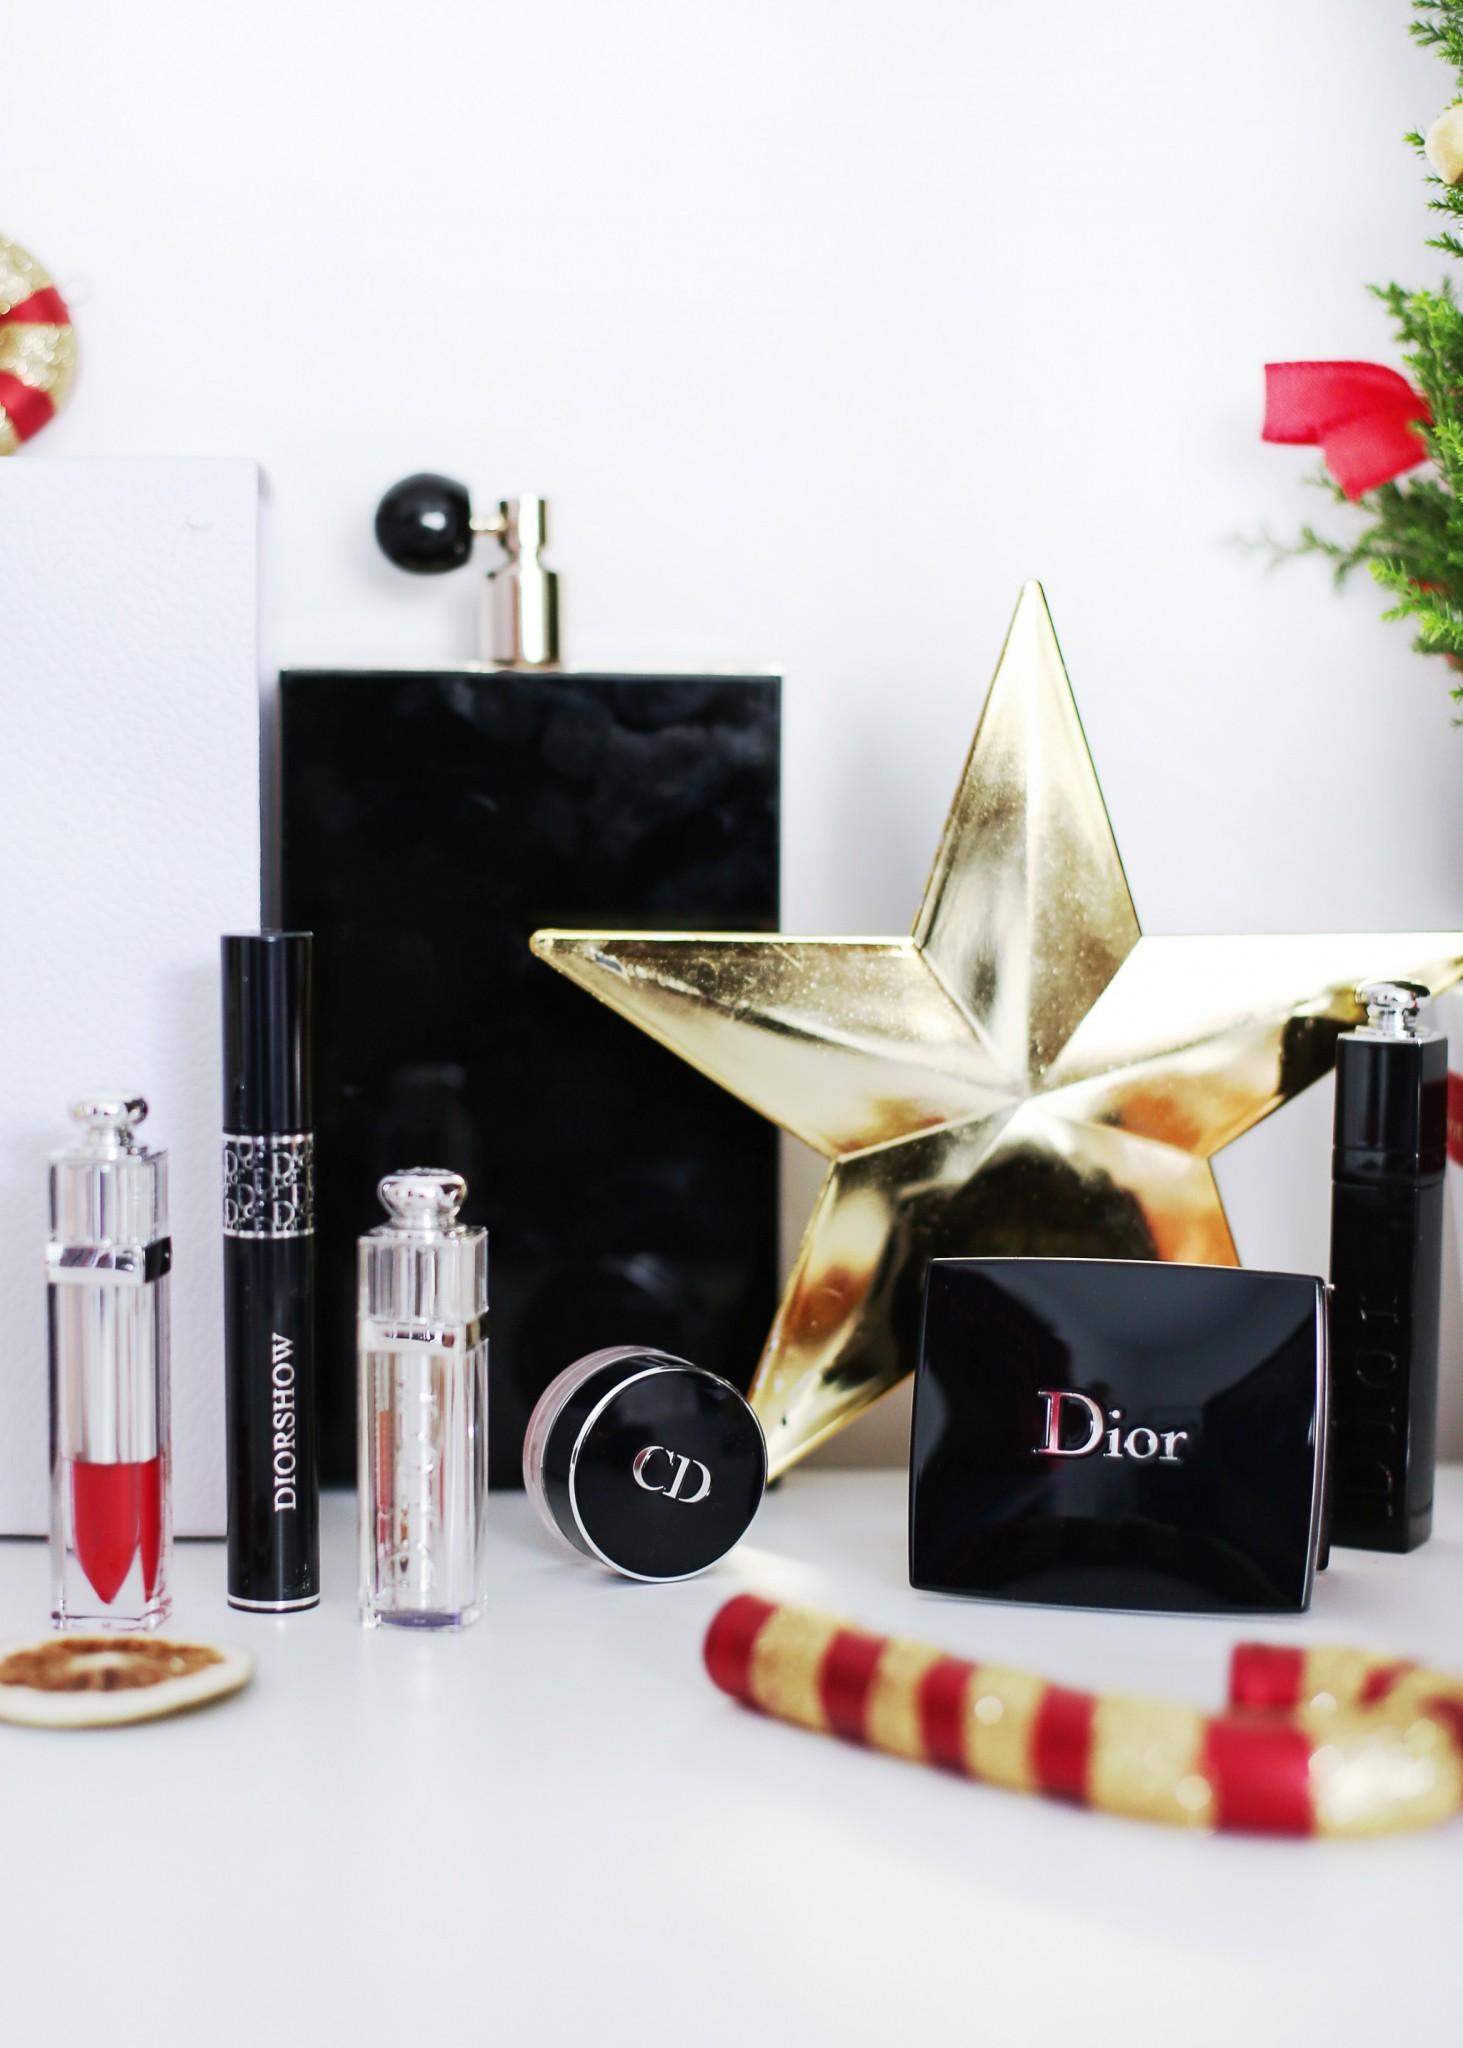 4dior_cadou_craciun_christmas_gifts_fabulous_muses_ideicadpouri